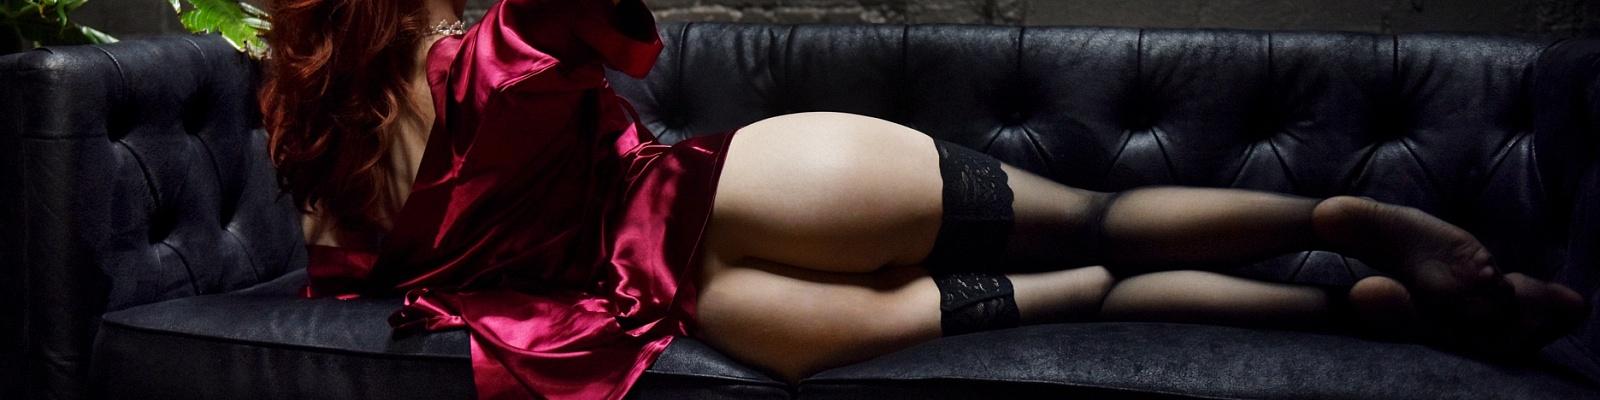 Evelyn Scott's Cover Photo